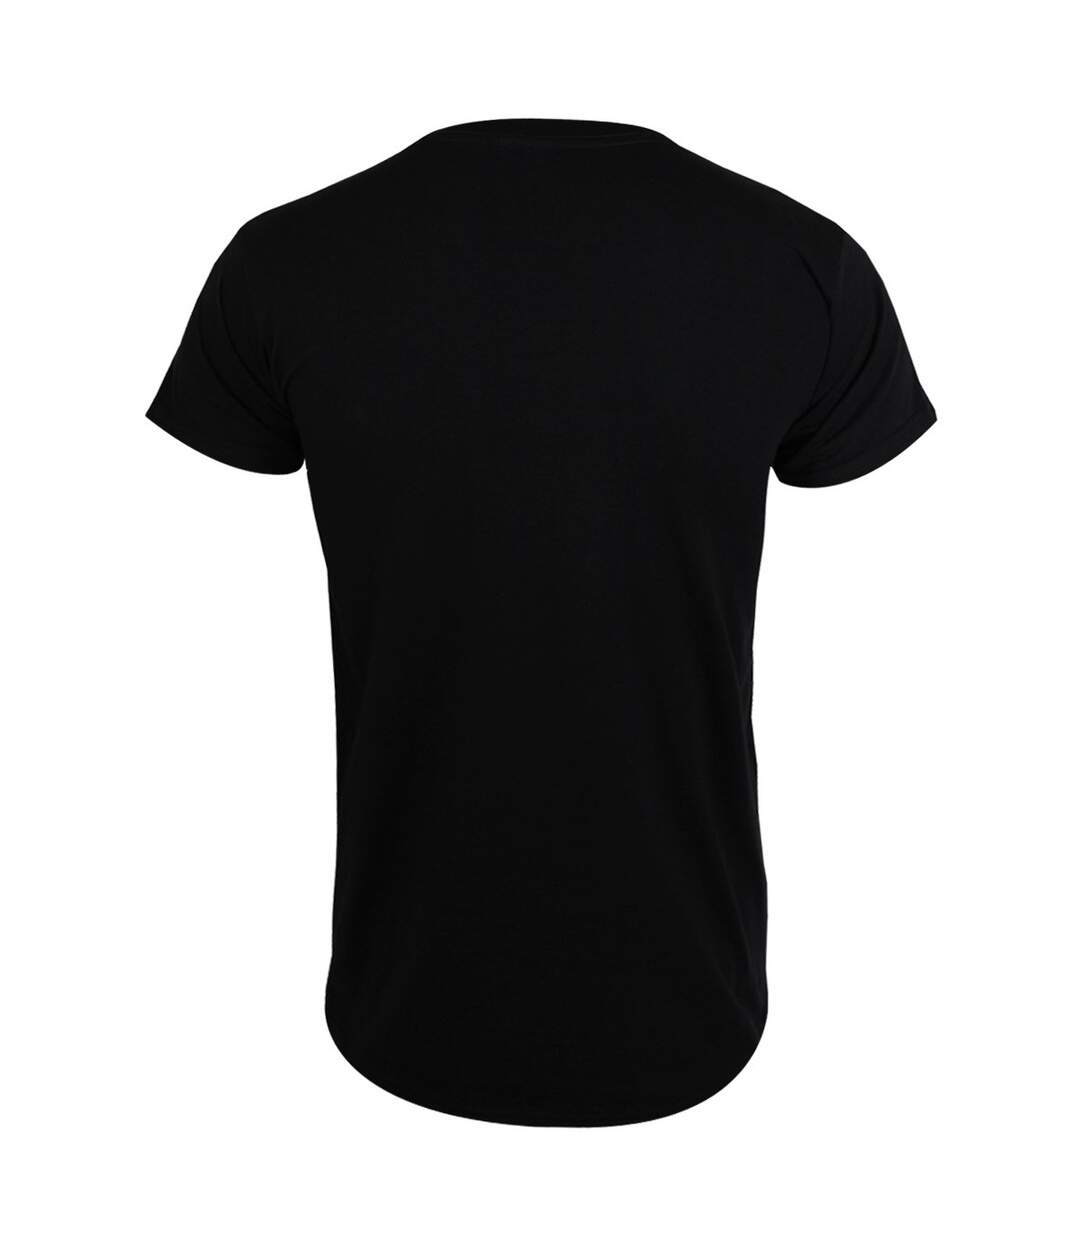 Tokyo Spirit Mens Gosu Monochrome T-Shirt (Black) - UTGR4110